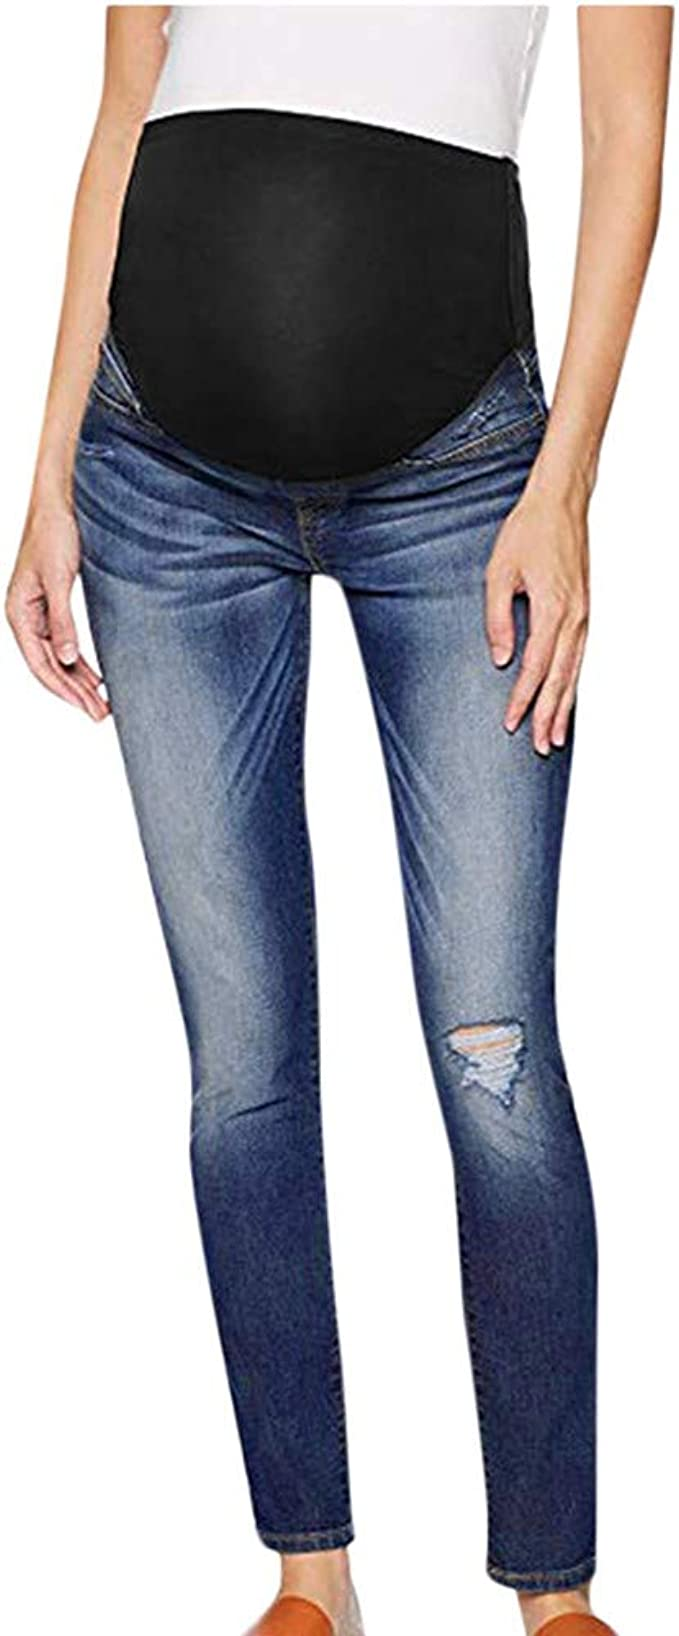 Pantaloncini di Jeans Strappati da Donna Incinta Tute Salopette di maternit/à Moda Salopette di Jeans Salopette